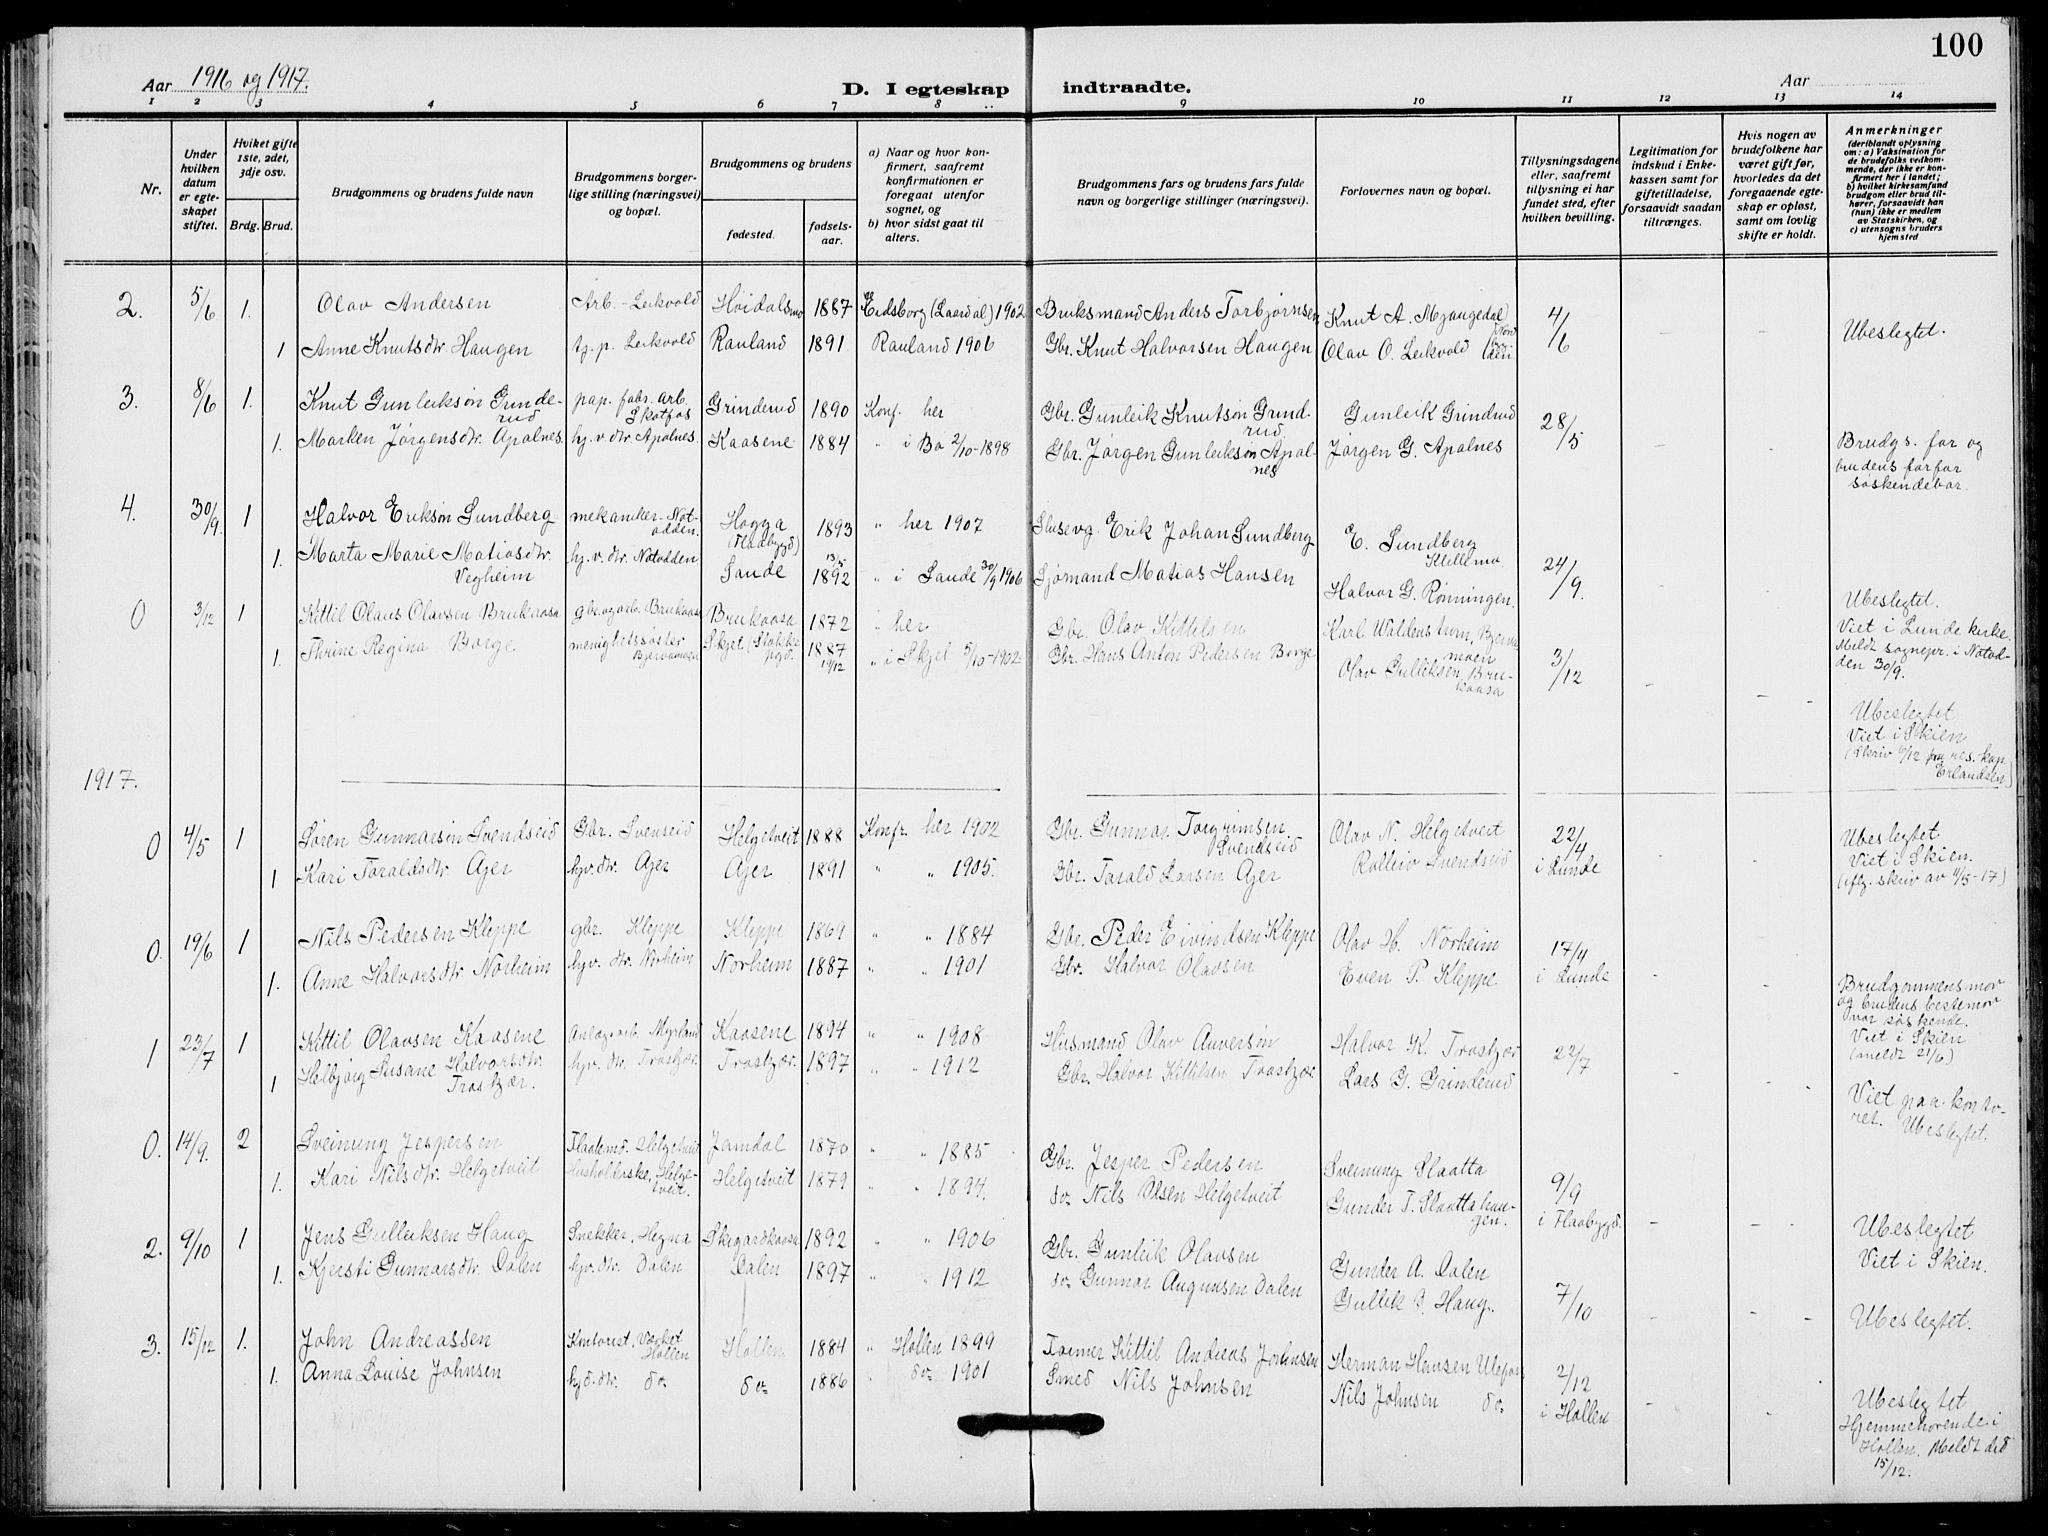 SAKO, Lunde kirkebøker, F/Fa/L0005: Ministerialbok nr. I 5, 1914-1922, s. 100